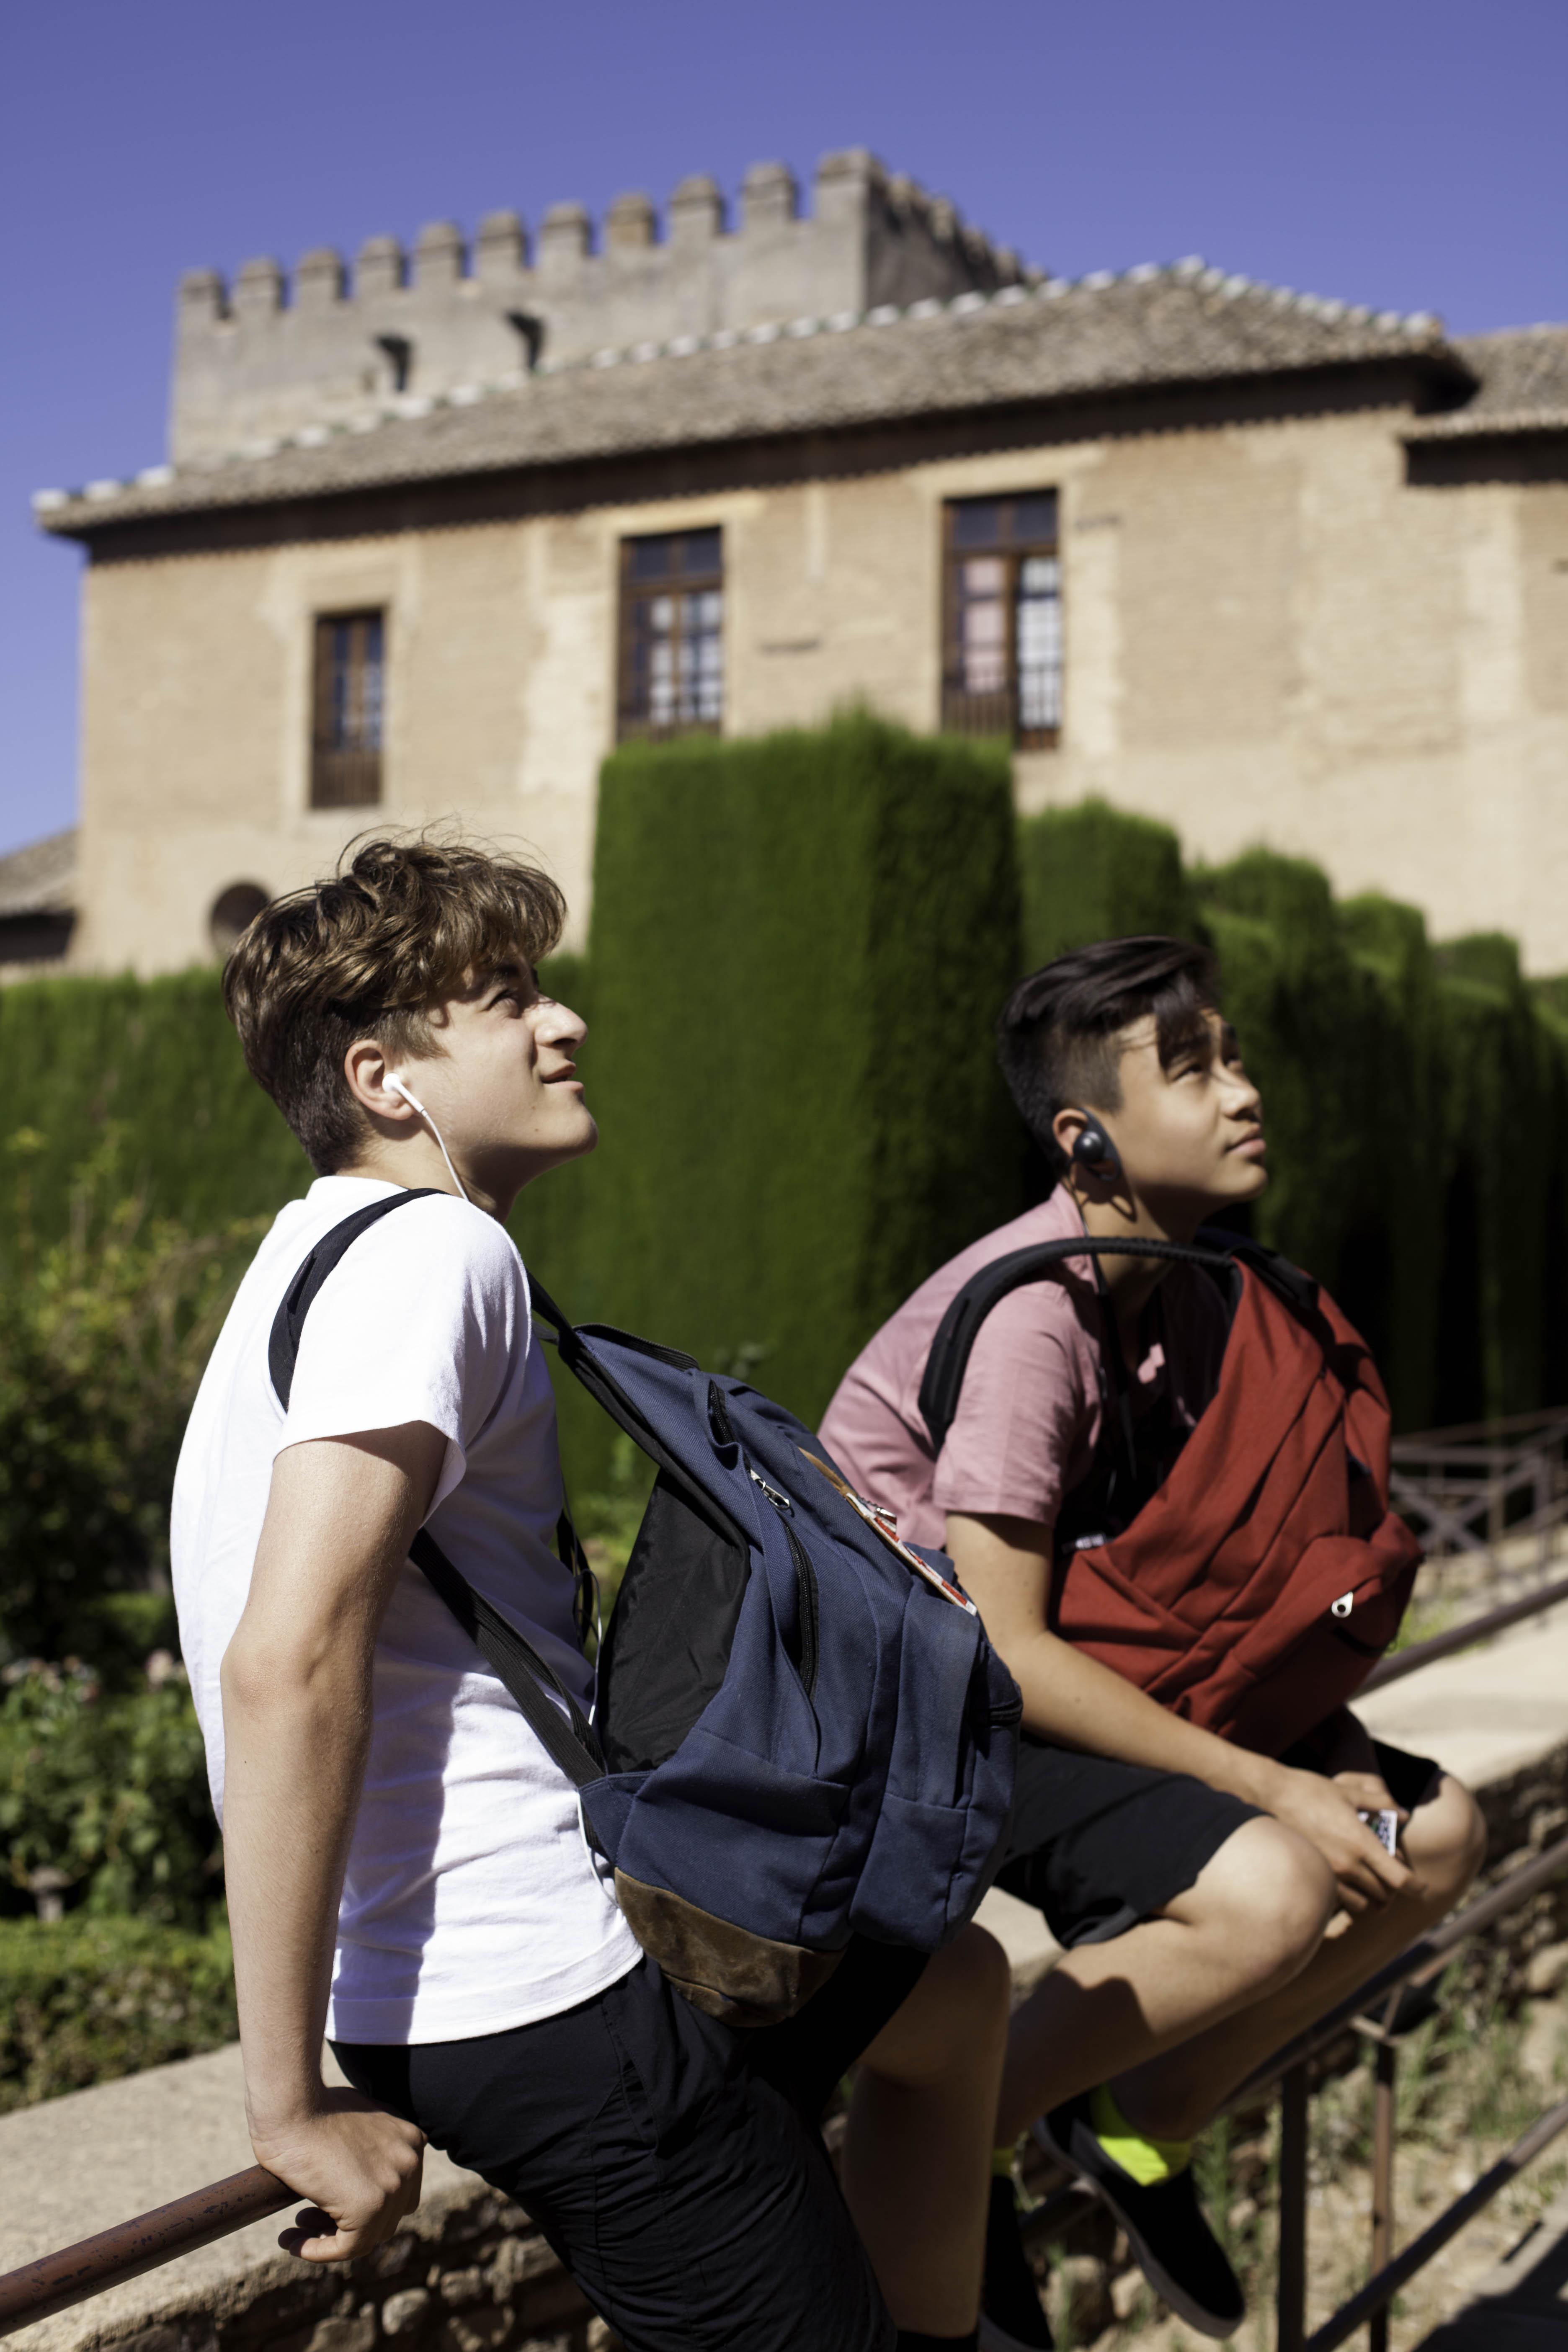 JSED_Espagne_Spain_Student Trip 1